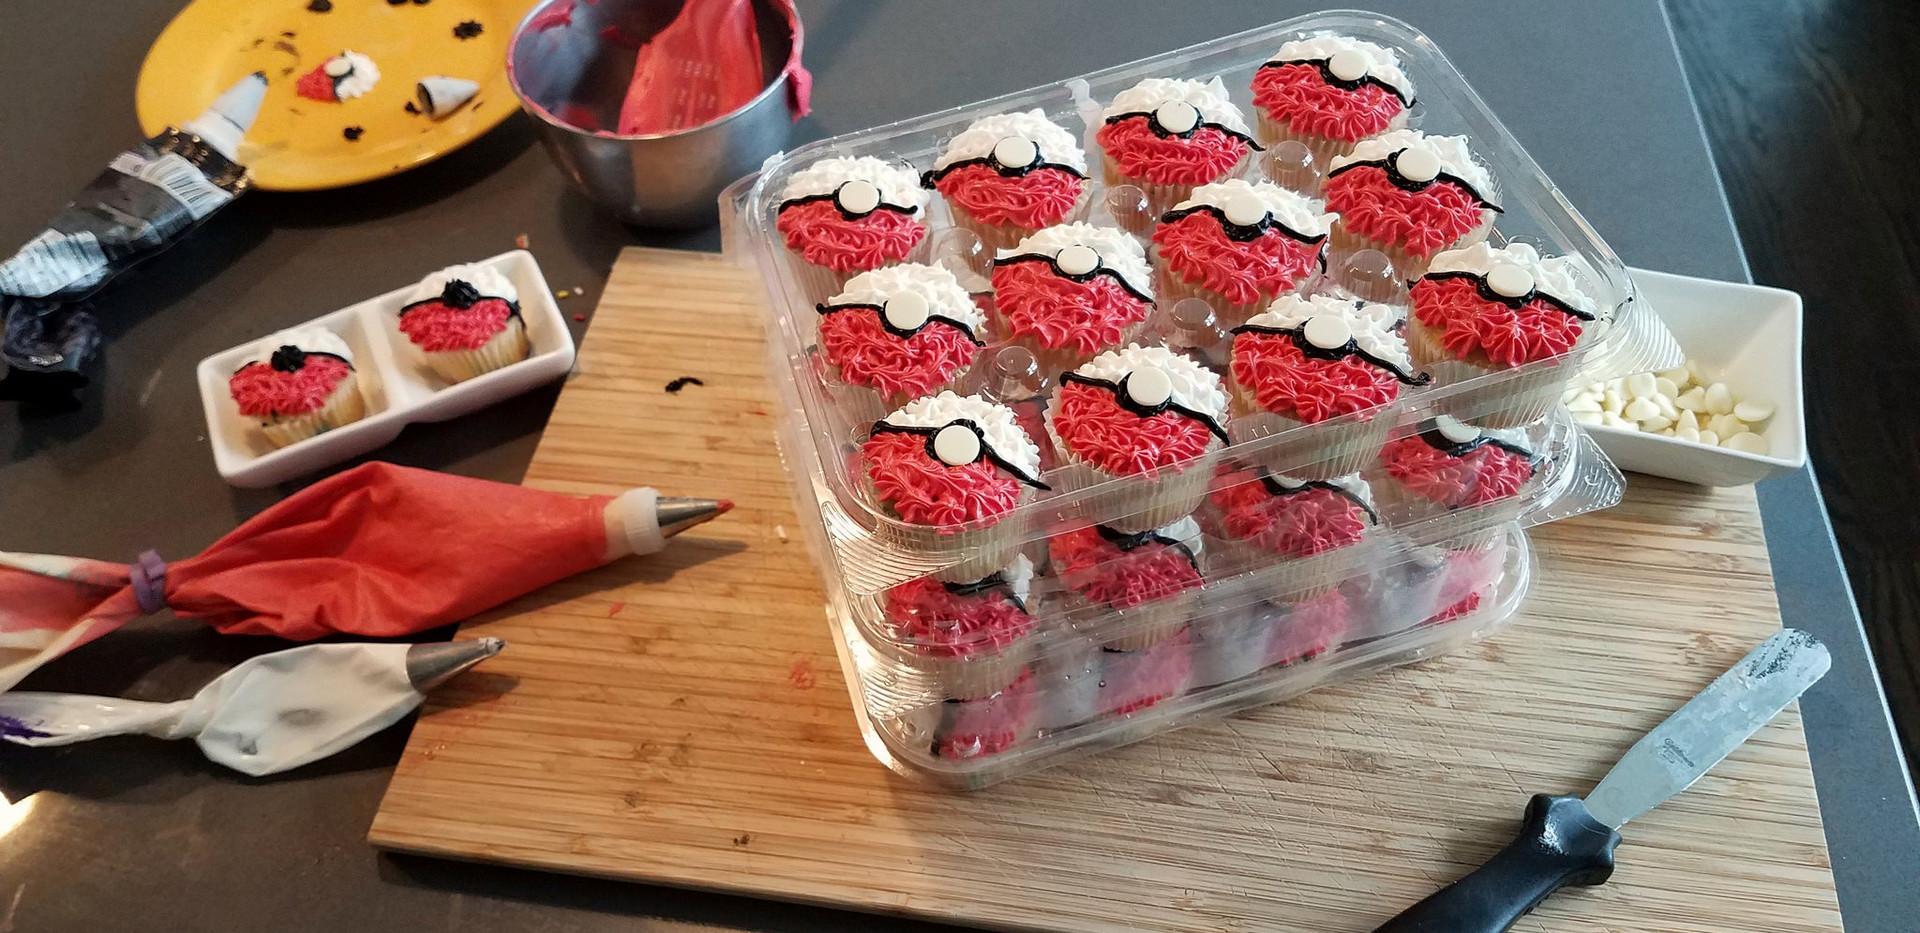 Homemade Pokemon cupcakes